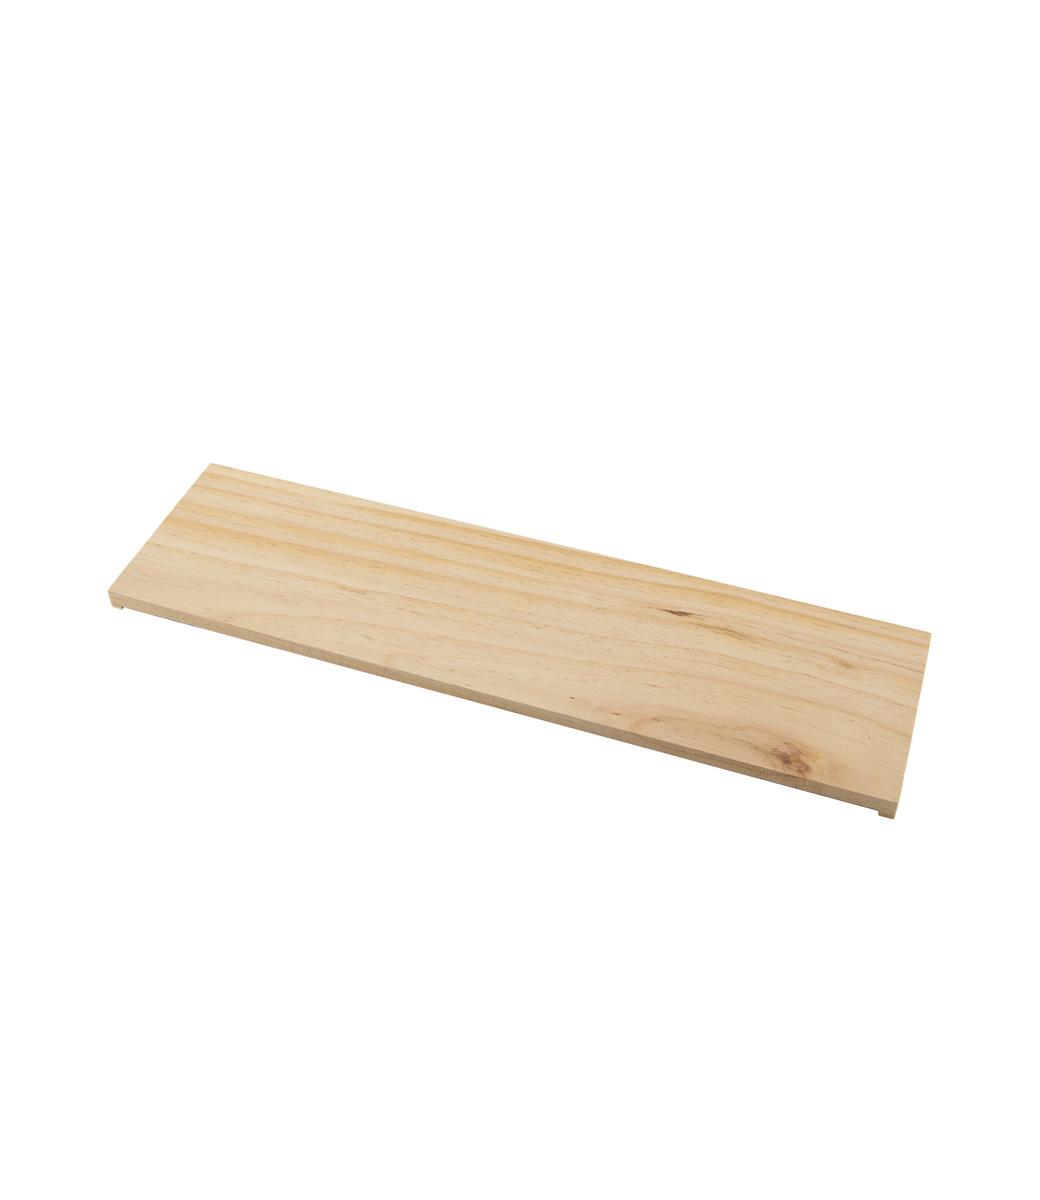 Wooden shelf - Wood-2